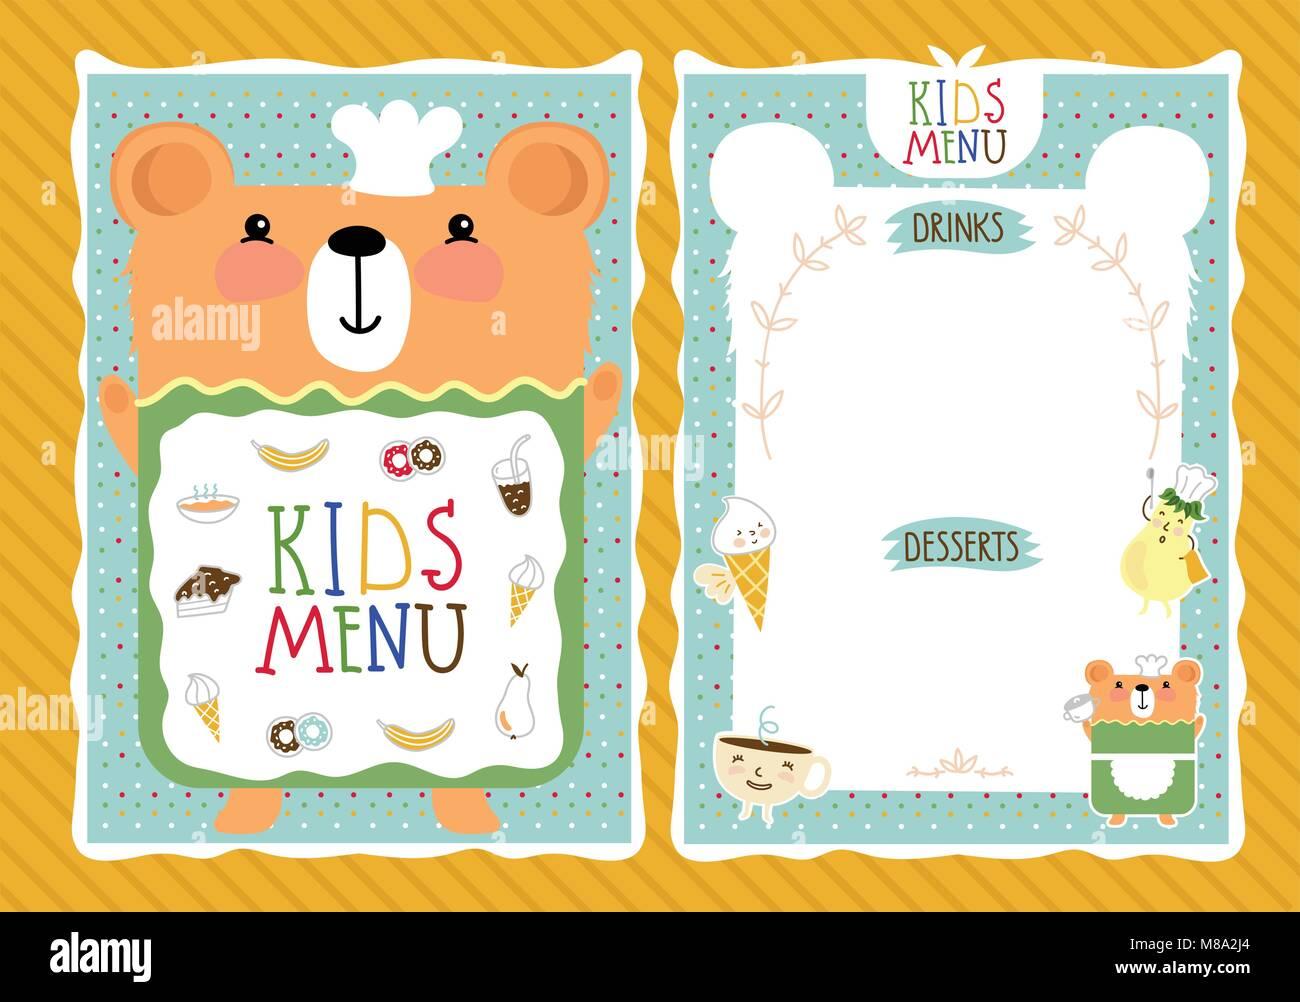 Cute Menu Card Vector Illustration Imágenes De Stock & Cute Menu ...